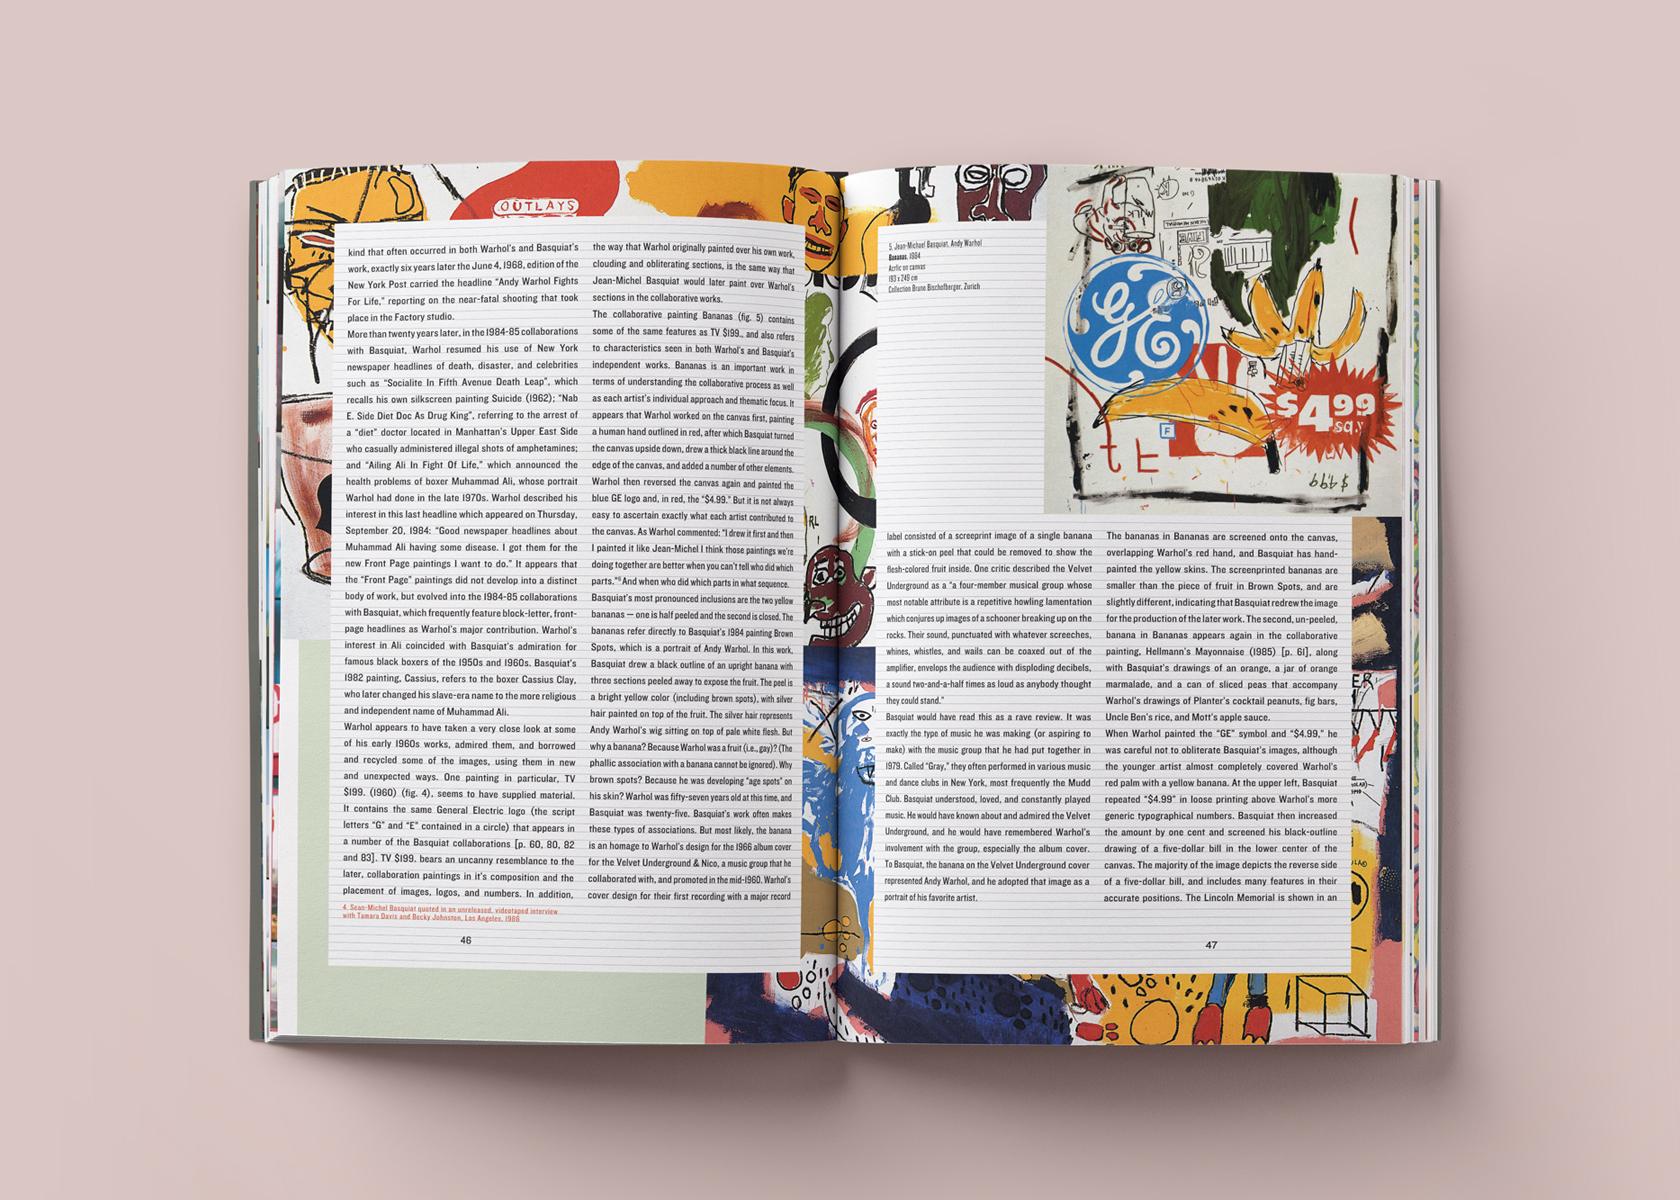 Warhol_Basquiat_Book_Spread_02